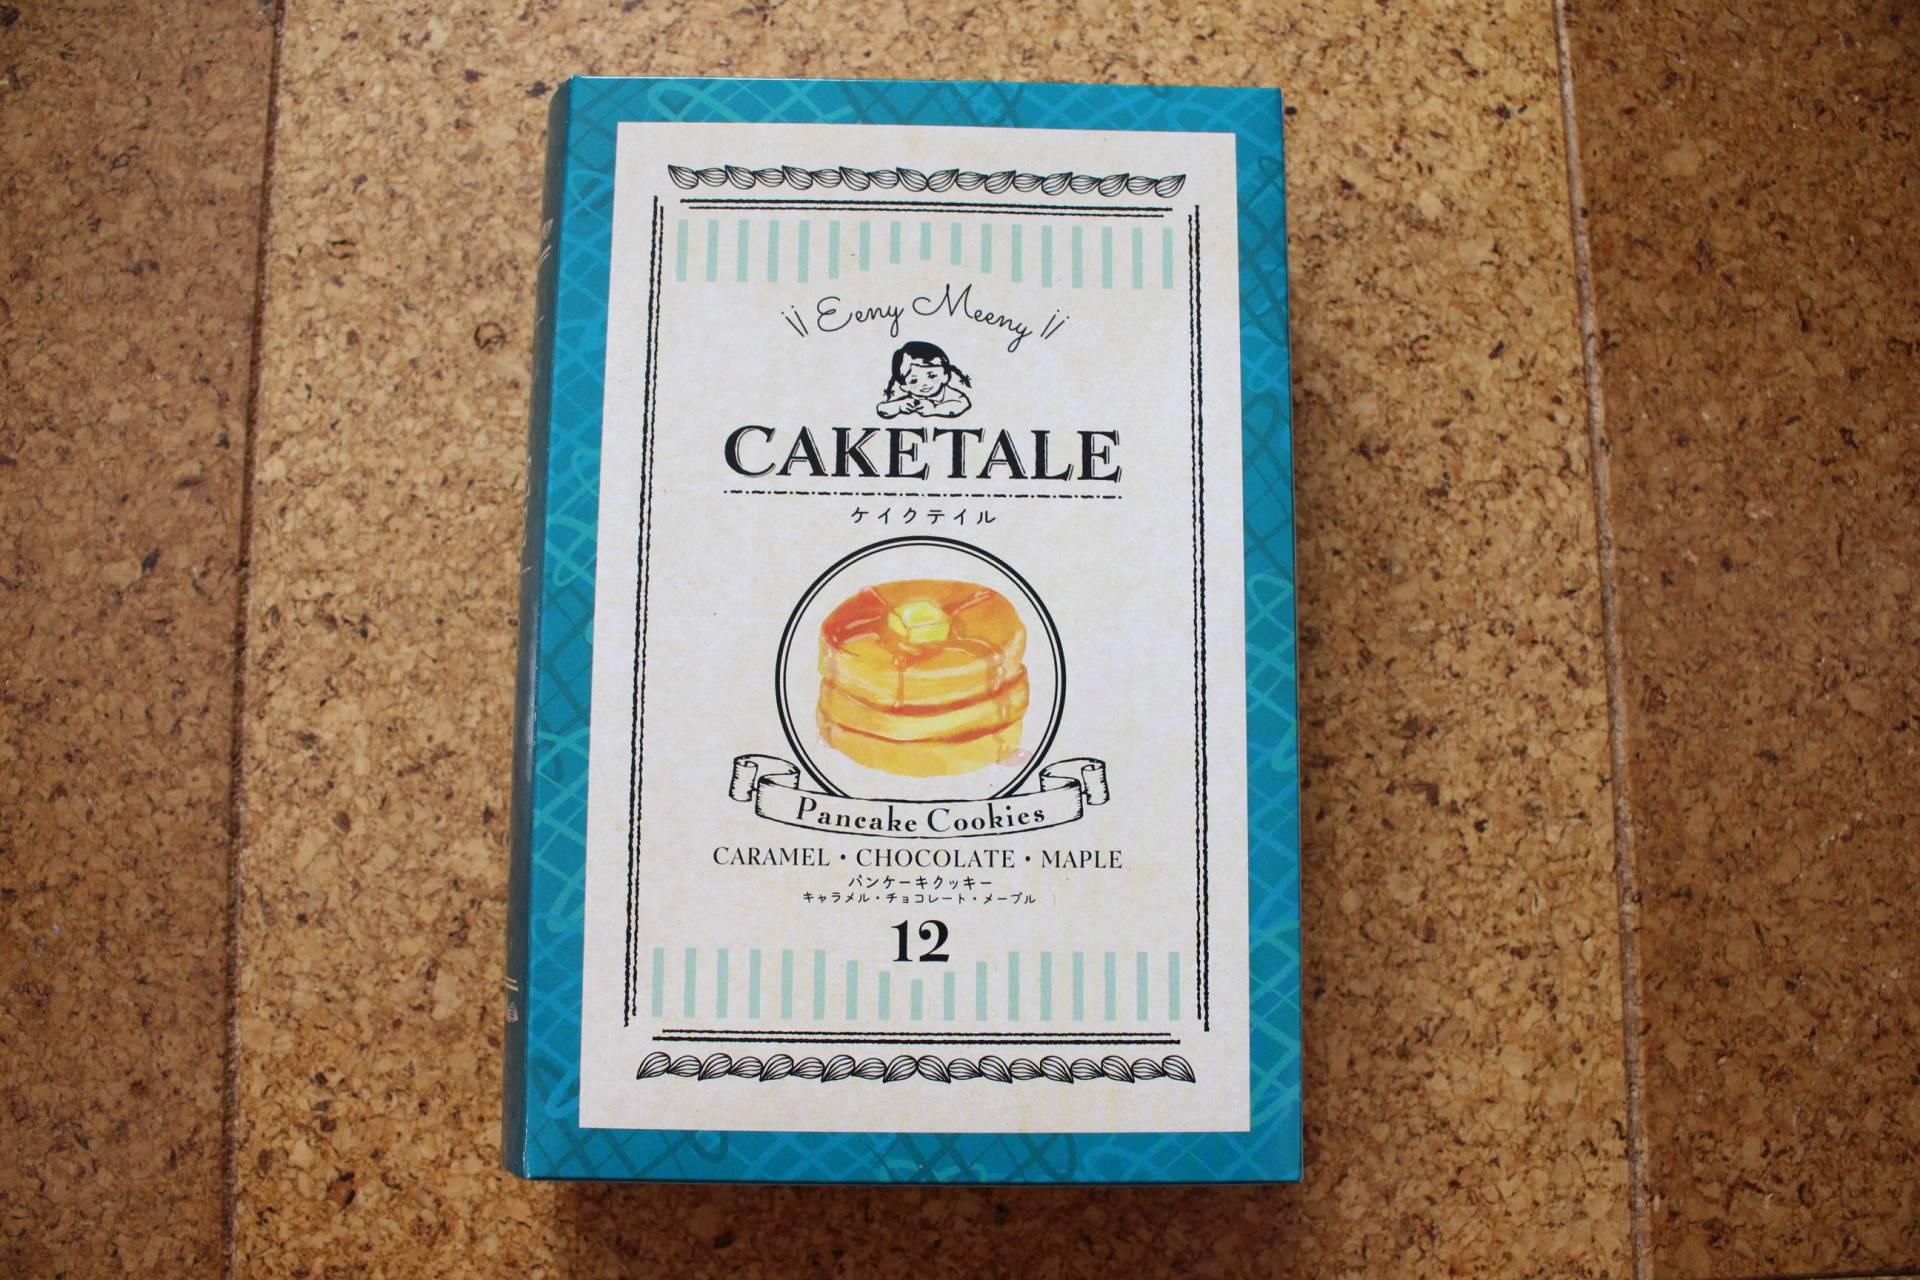 CAKETALE Assortment